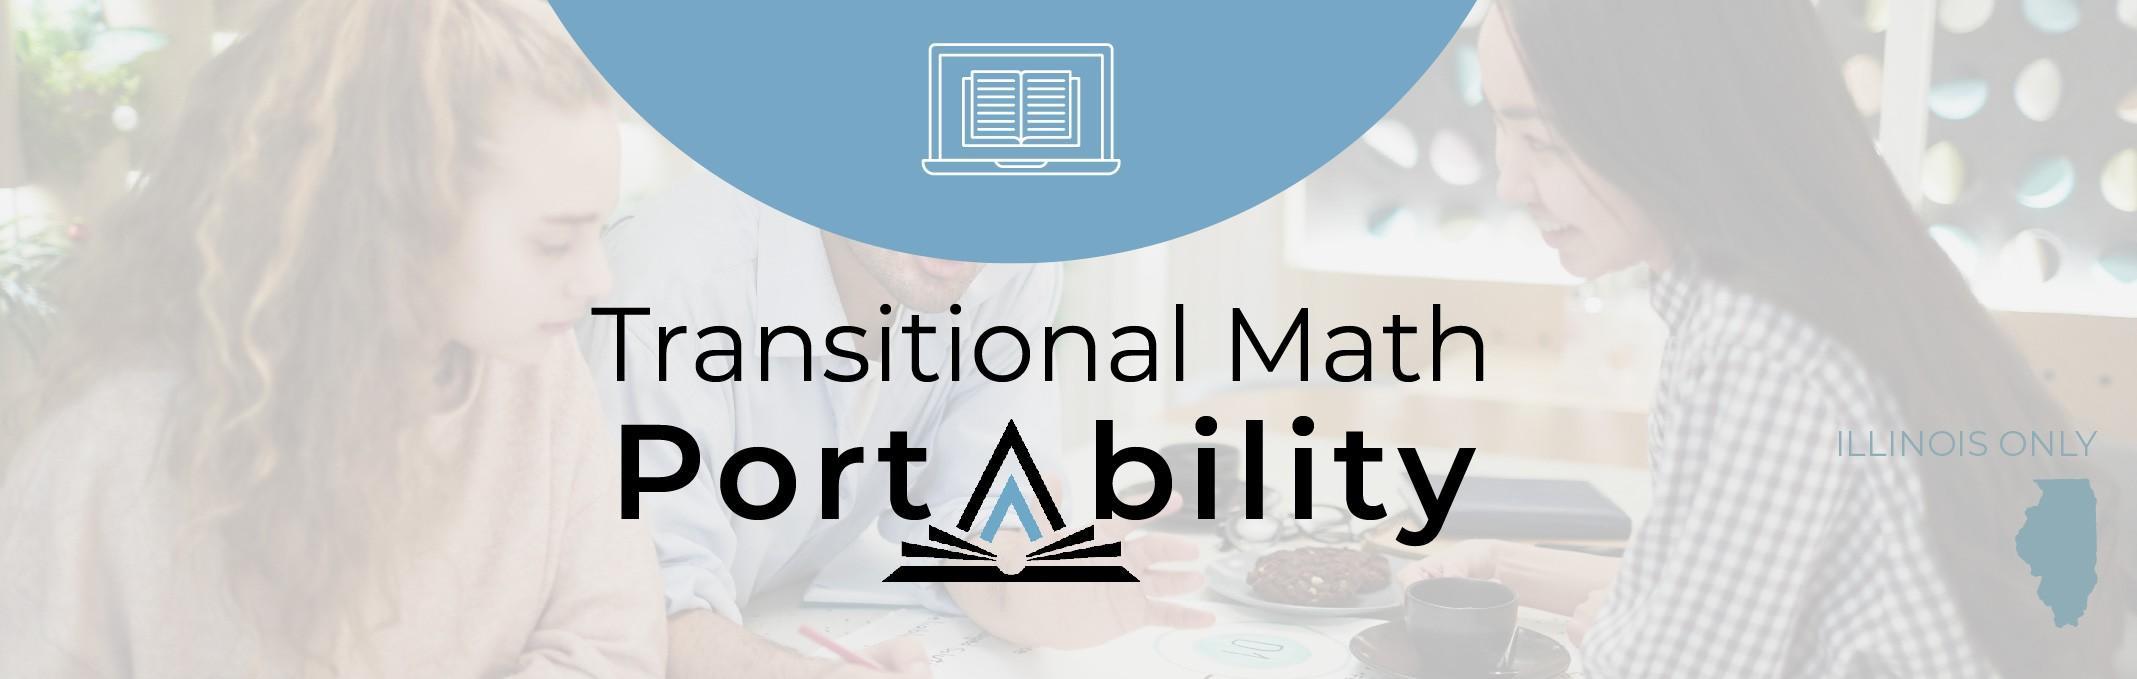 Portability Workshop